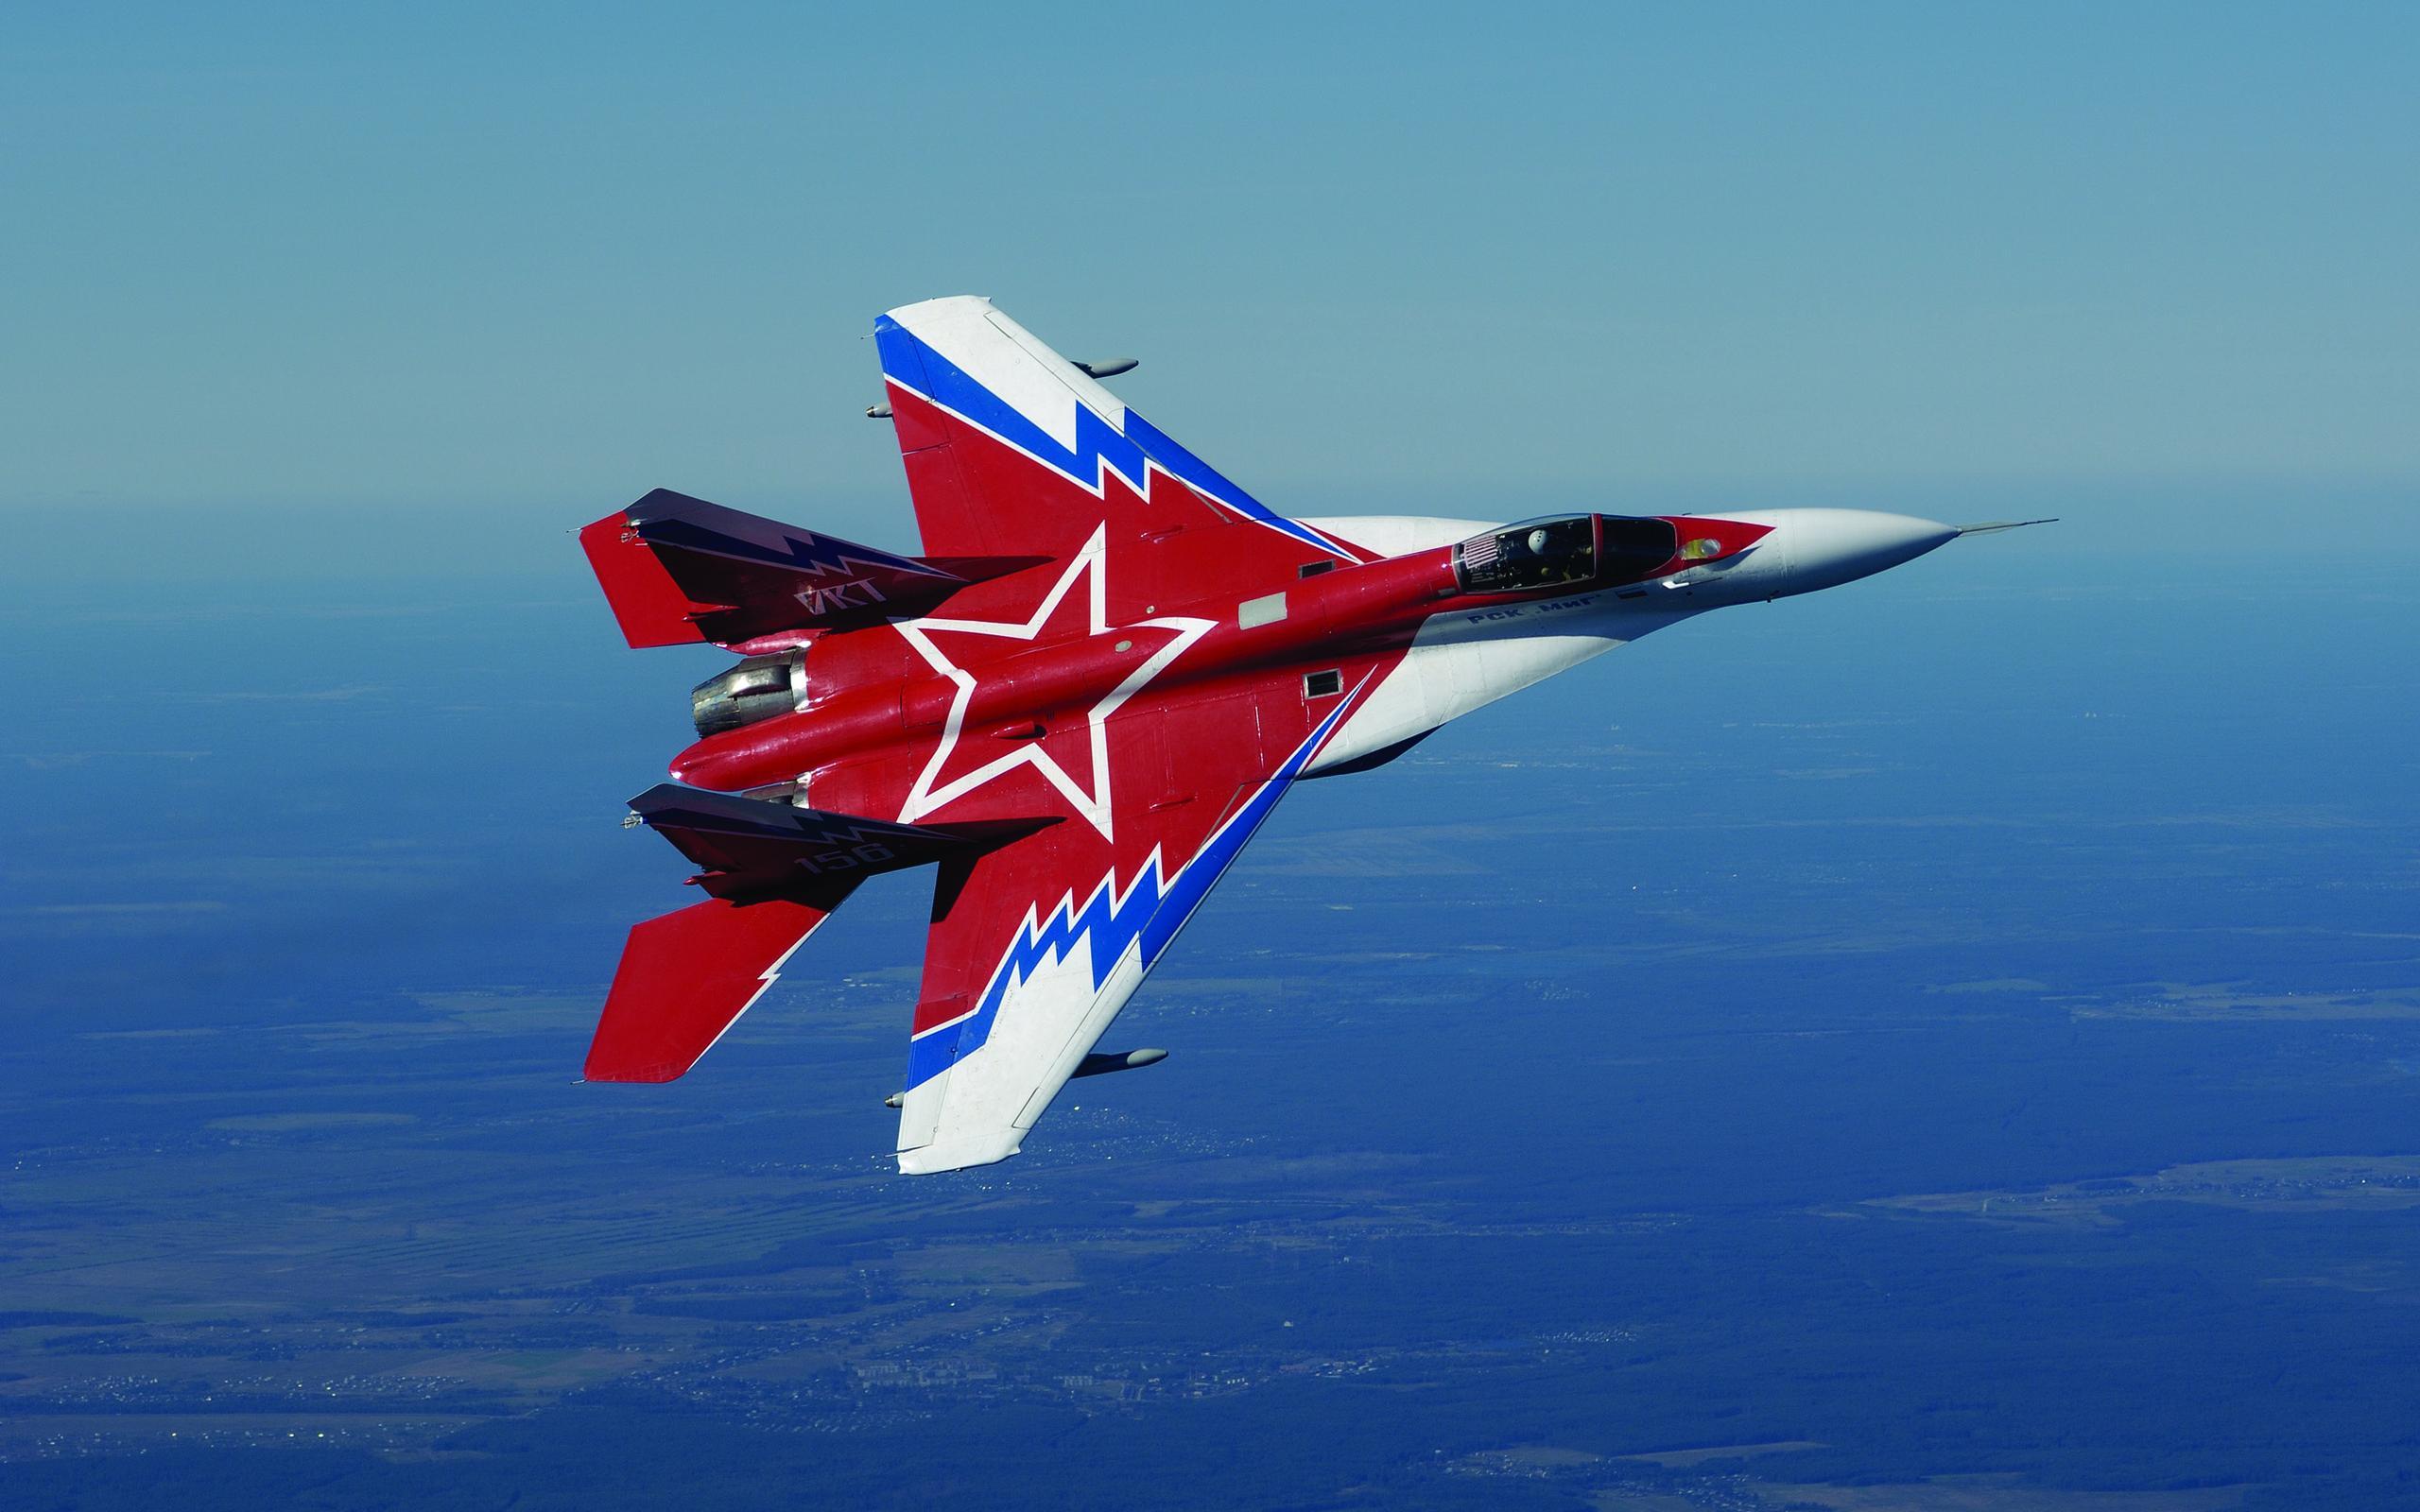 Mikoyan MiG-35 Wallpaper HD Download